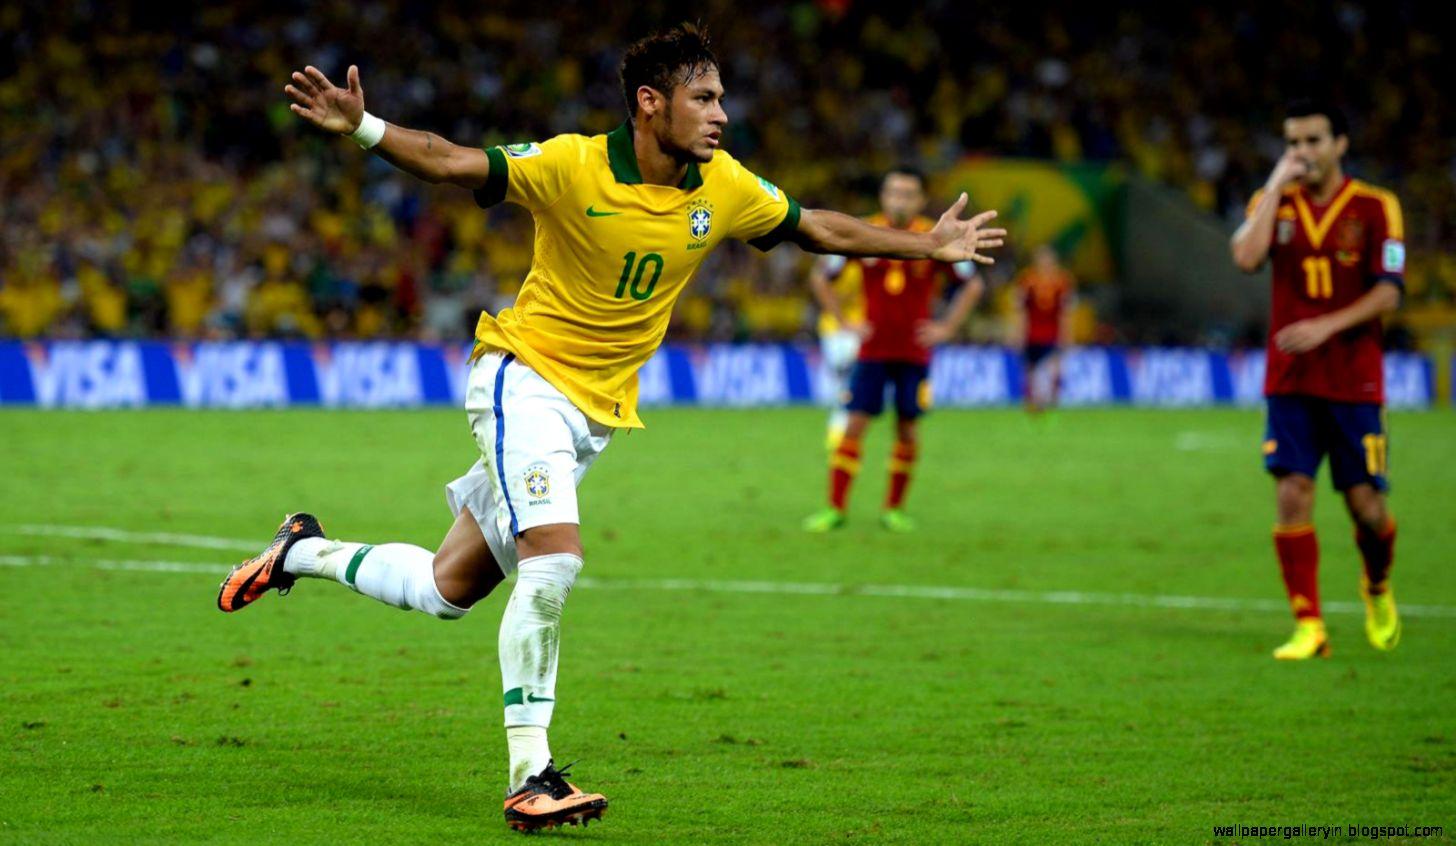 Capello Sebut Neymar Tukang Diving